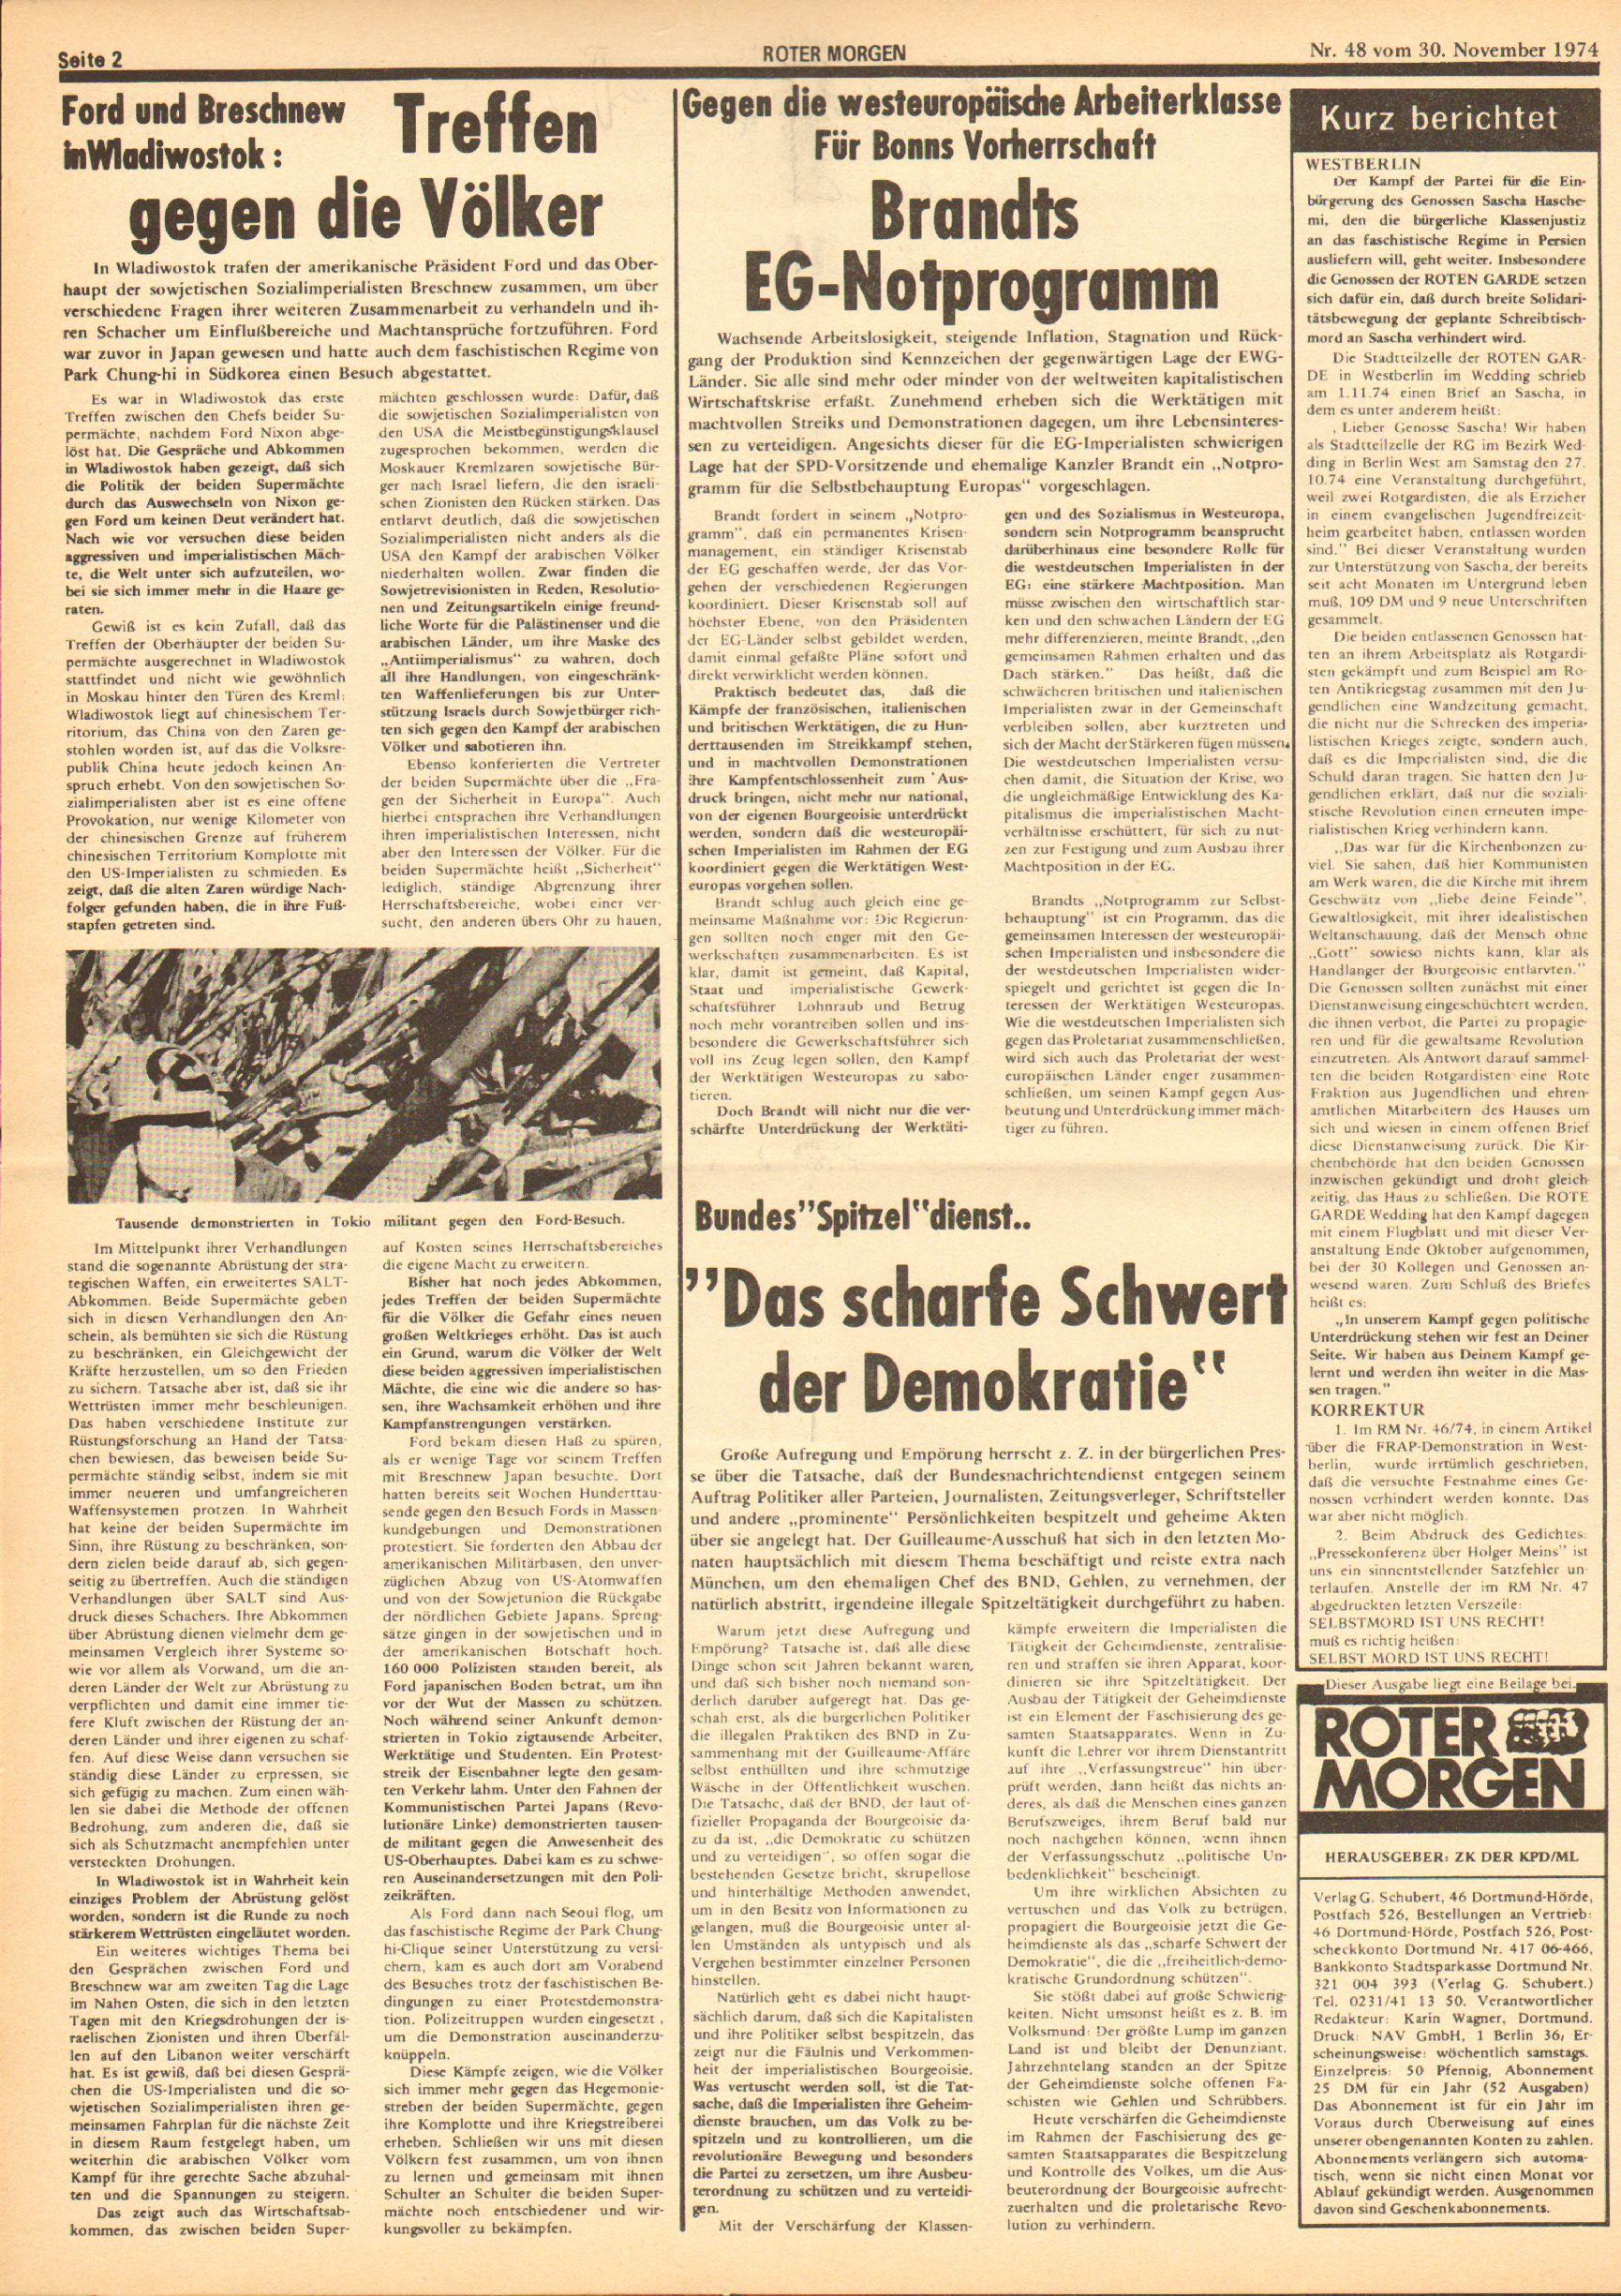 Roter Morgen, 8. Jg., 30. November 1974, Nr. 48, Seite 2